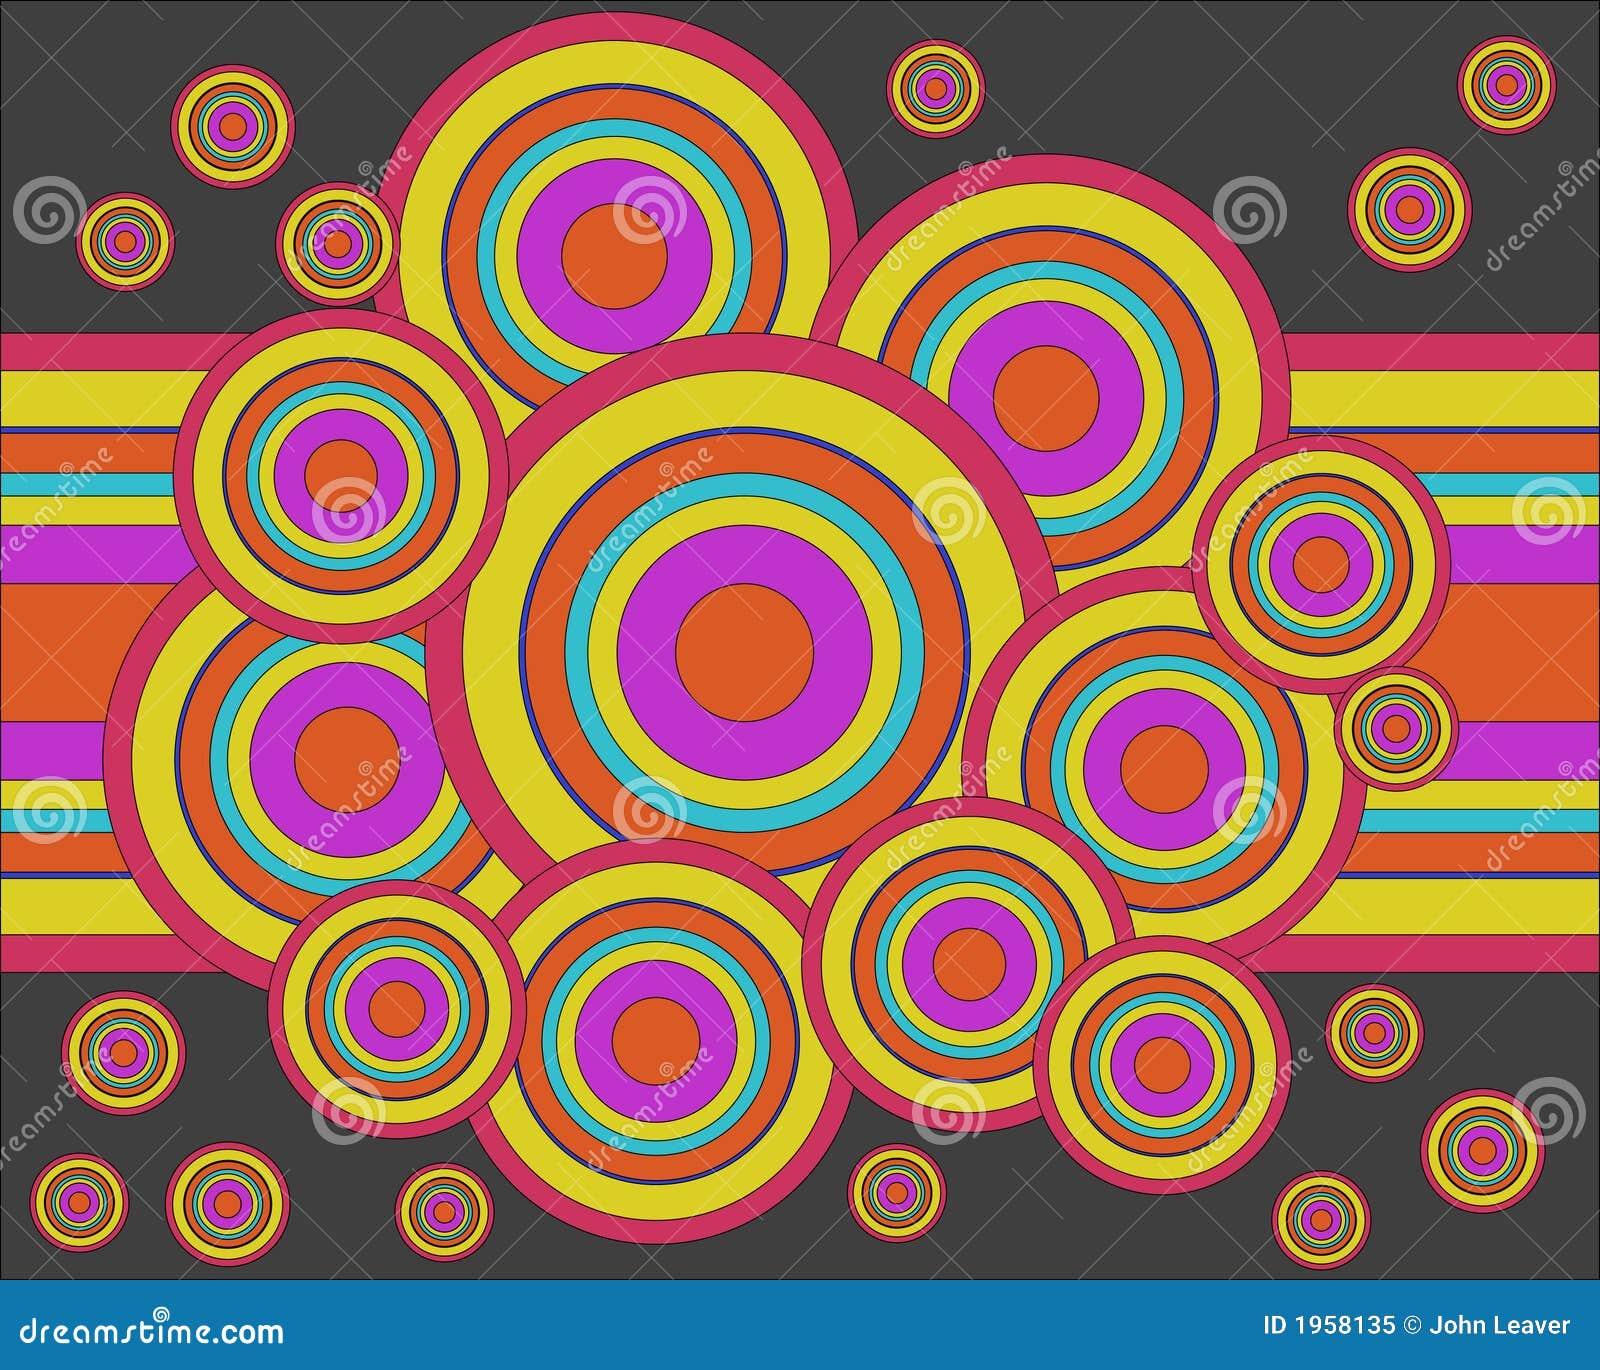 Dise o abstracto foto de archivo libre de regal as - Diseno de fotos ...